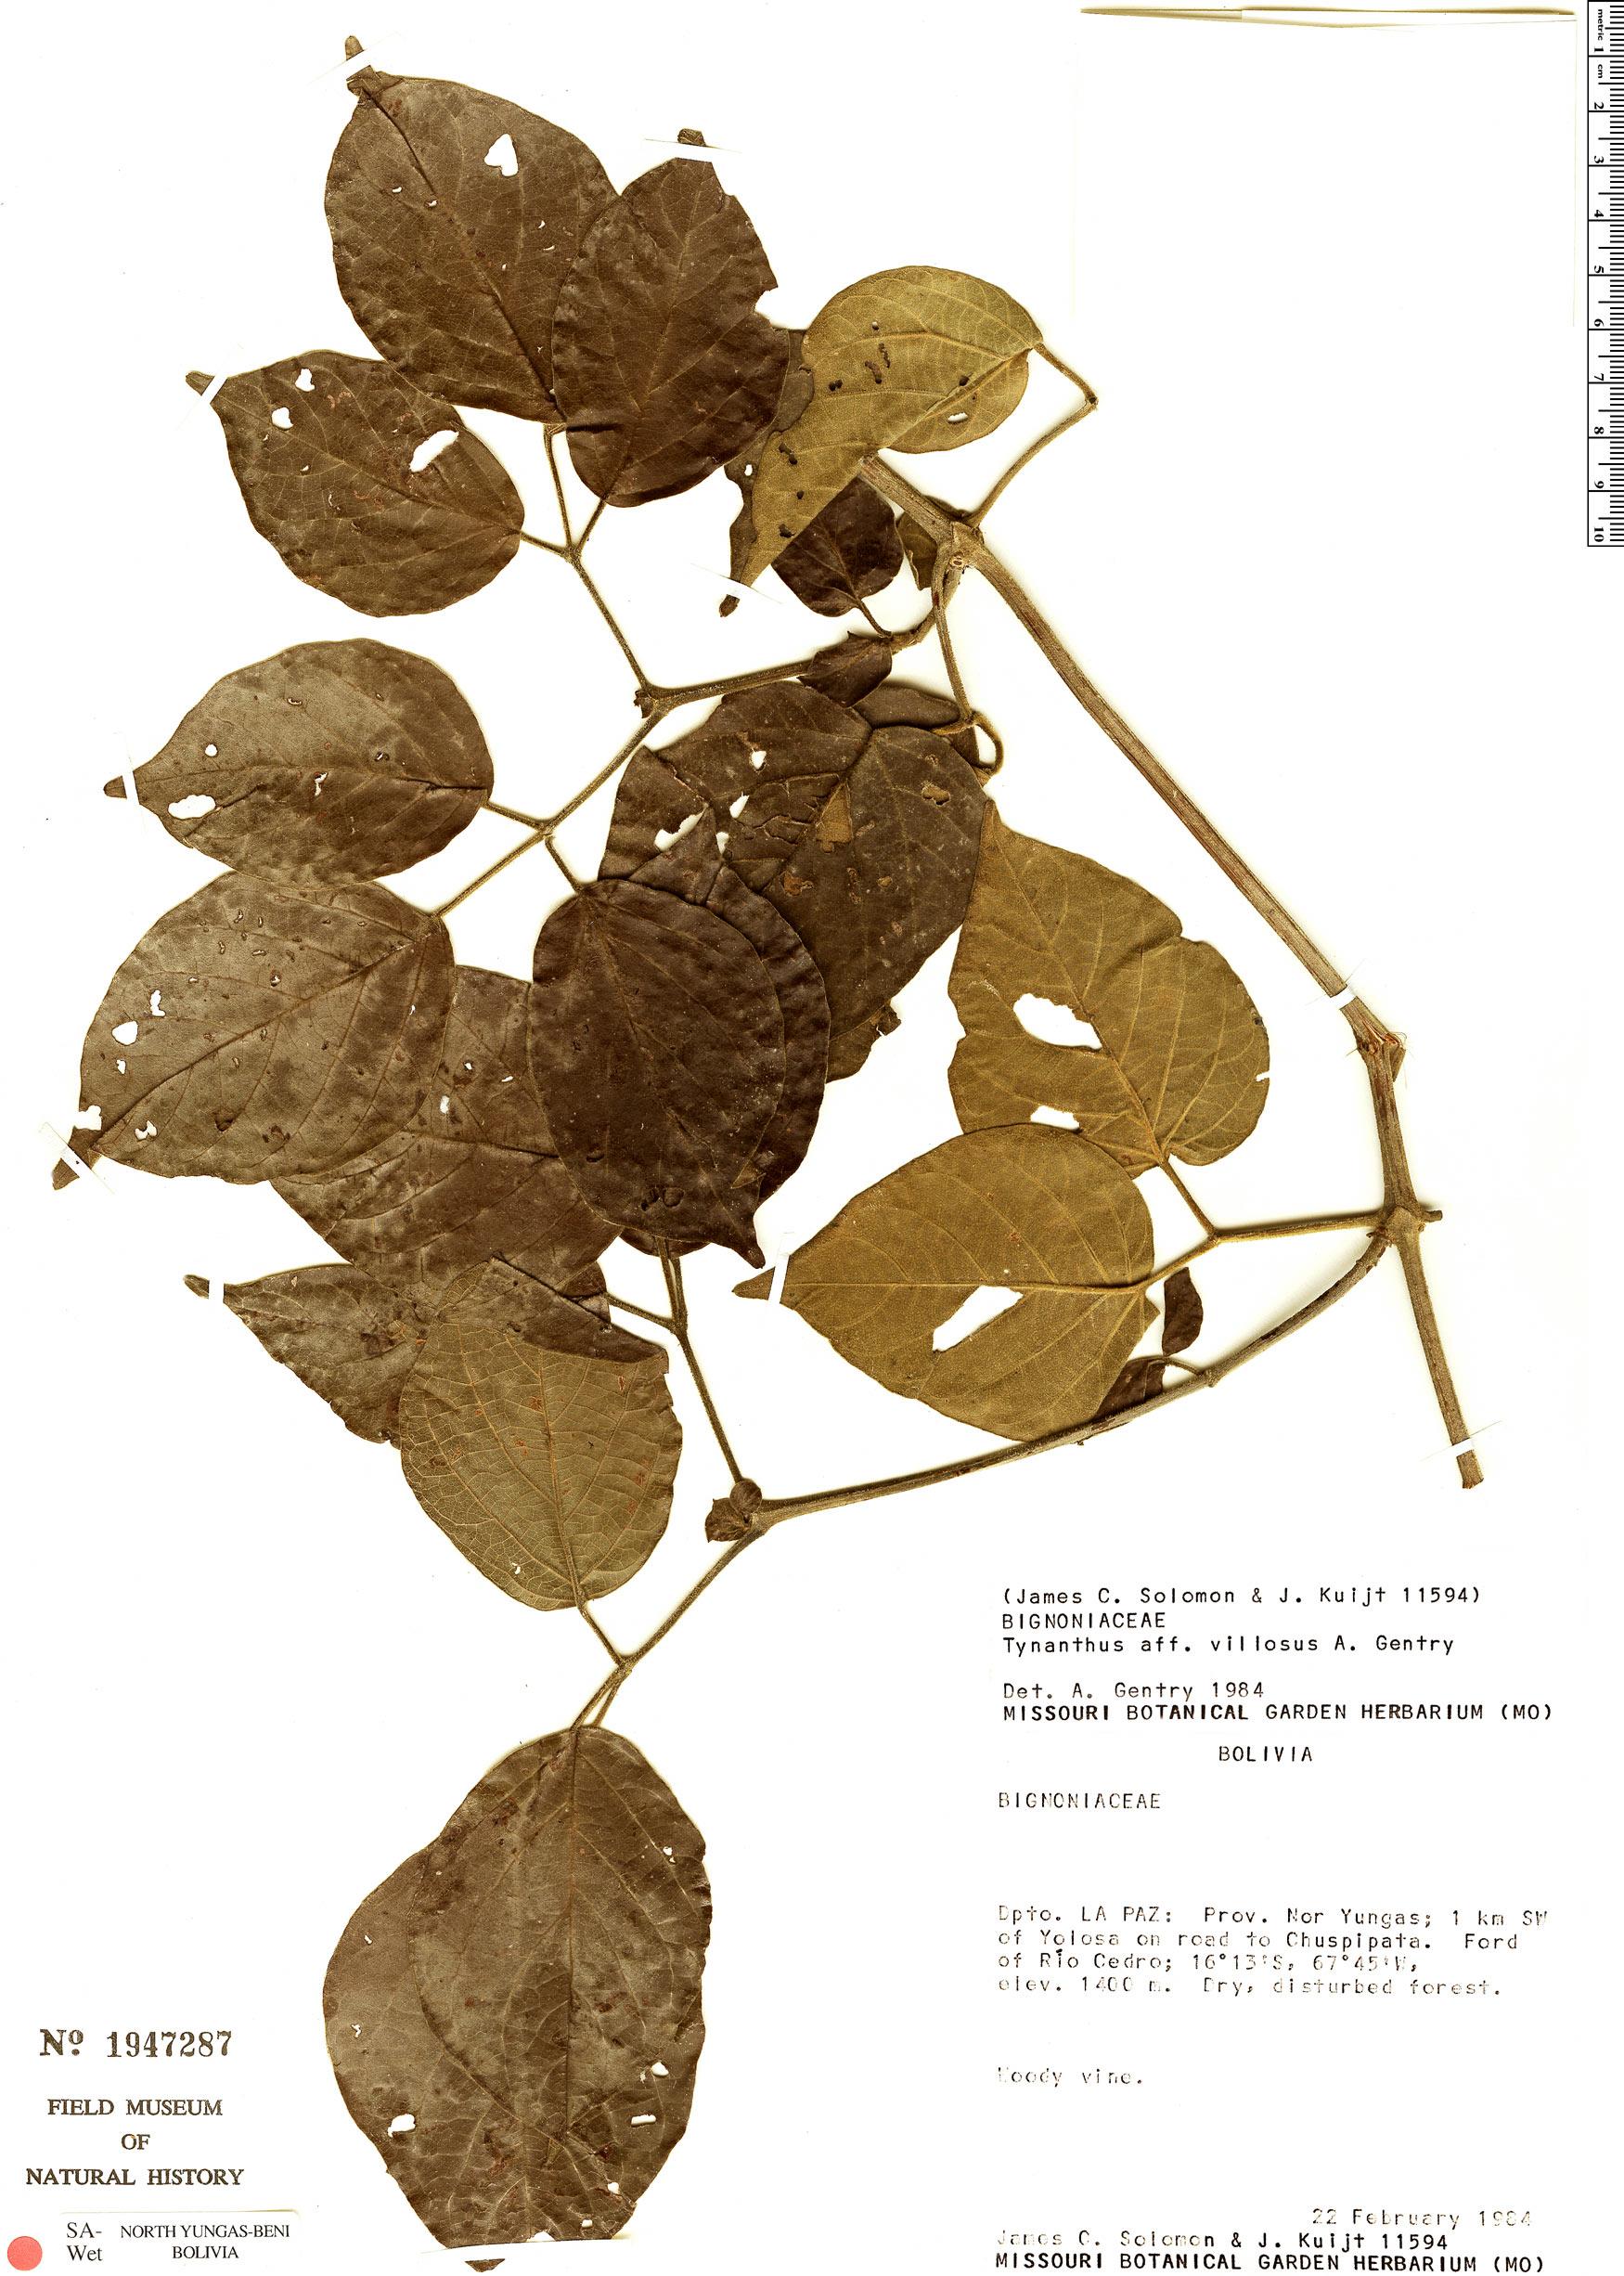 Specimen: Tynanthus villosus